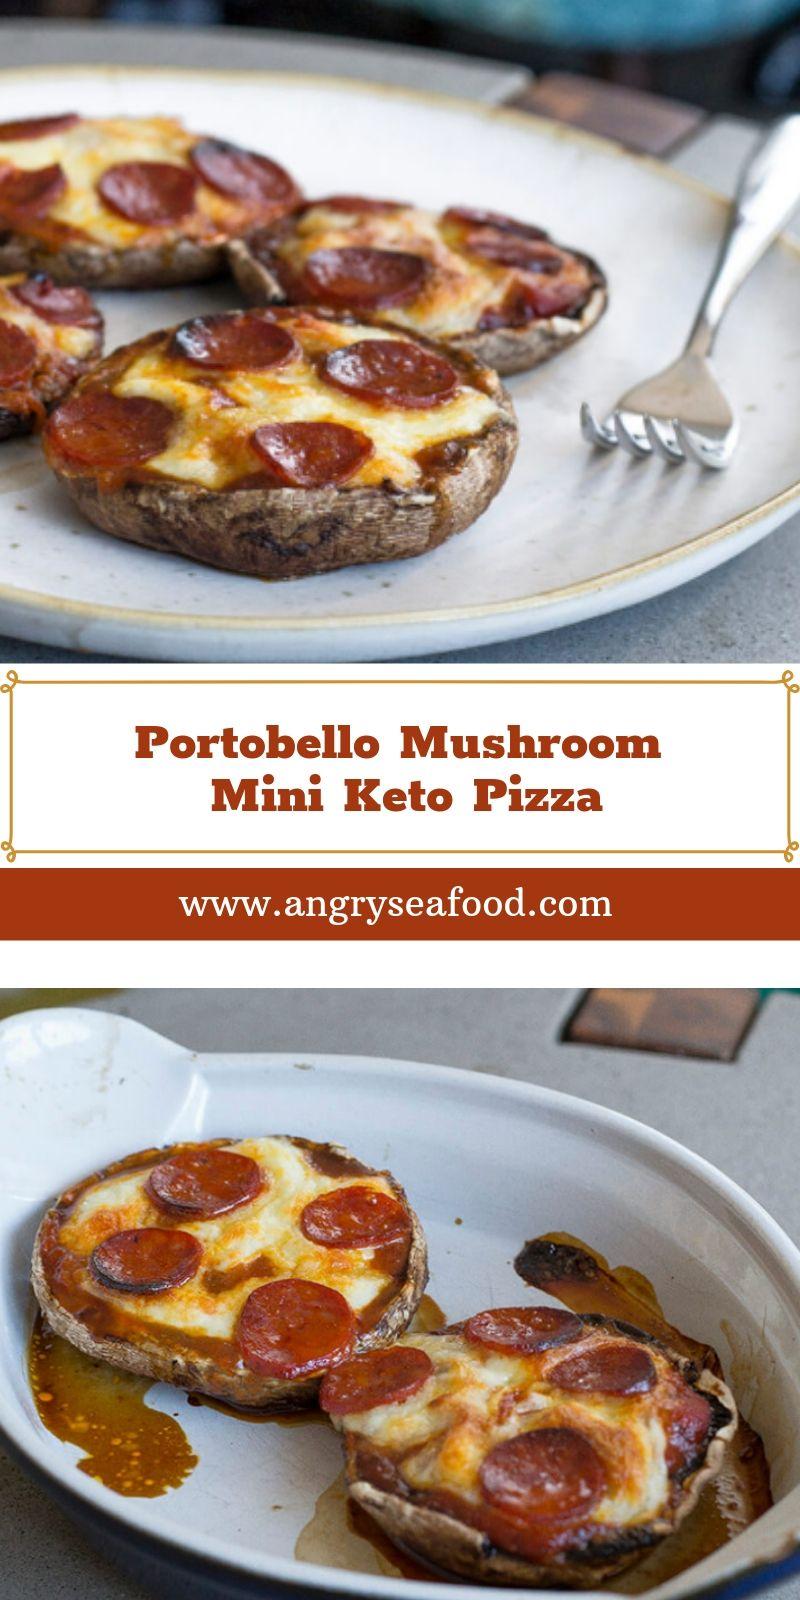 Portobello Mushroom Mini Keto Pizza